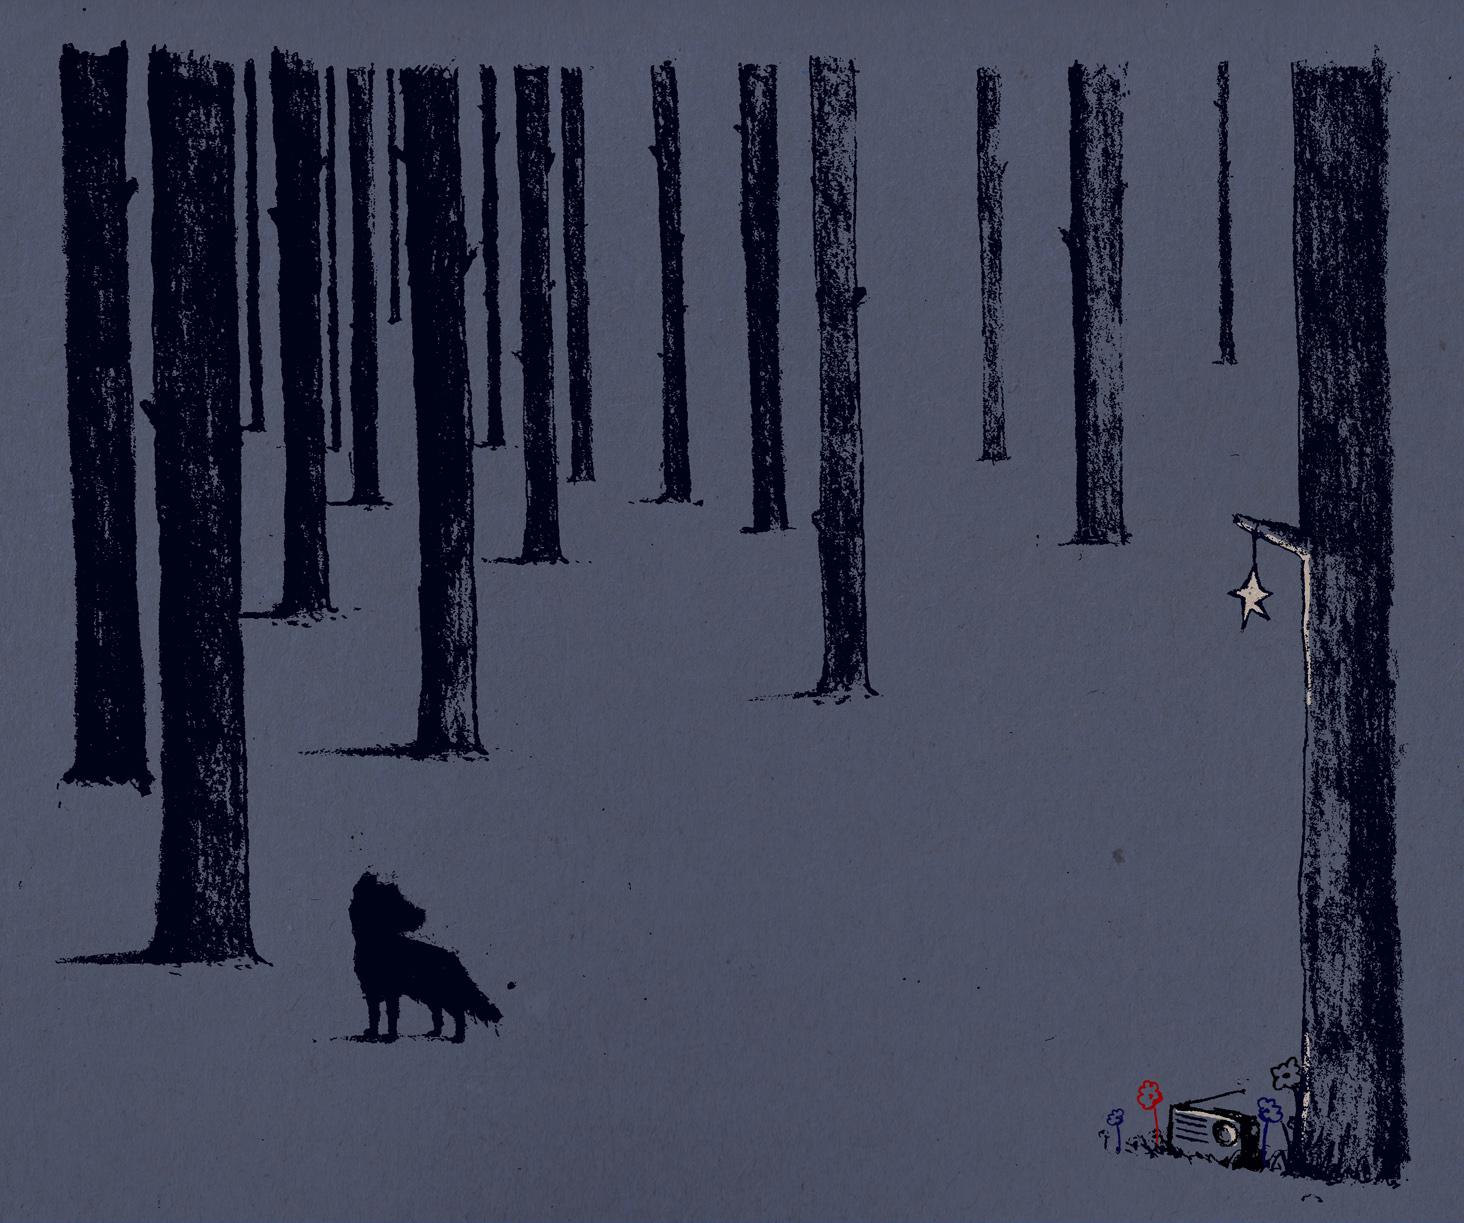 Album artwork by Jacob Stack.